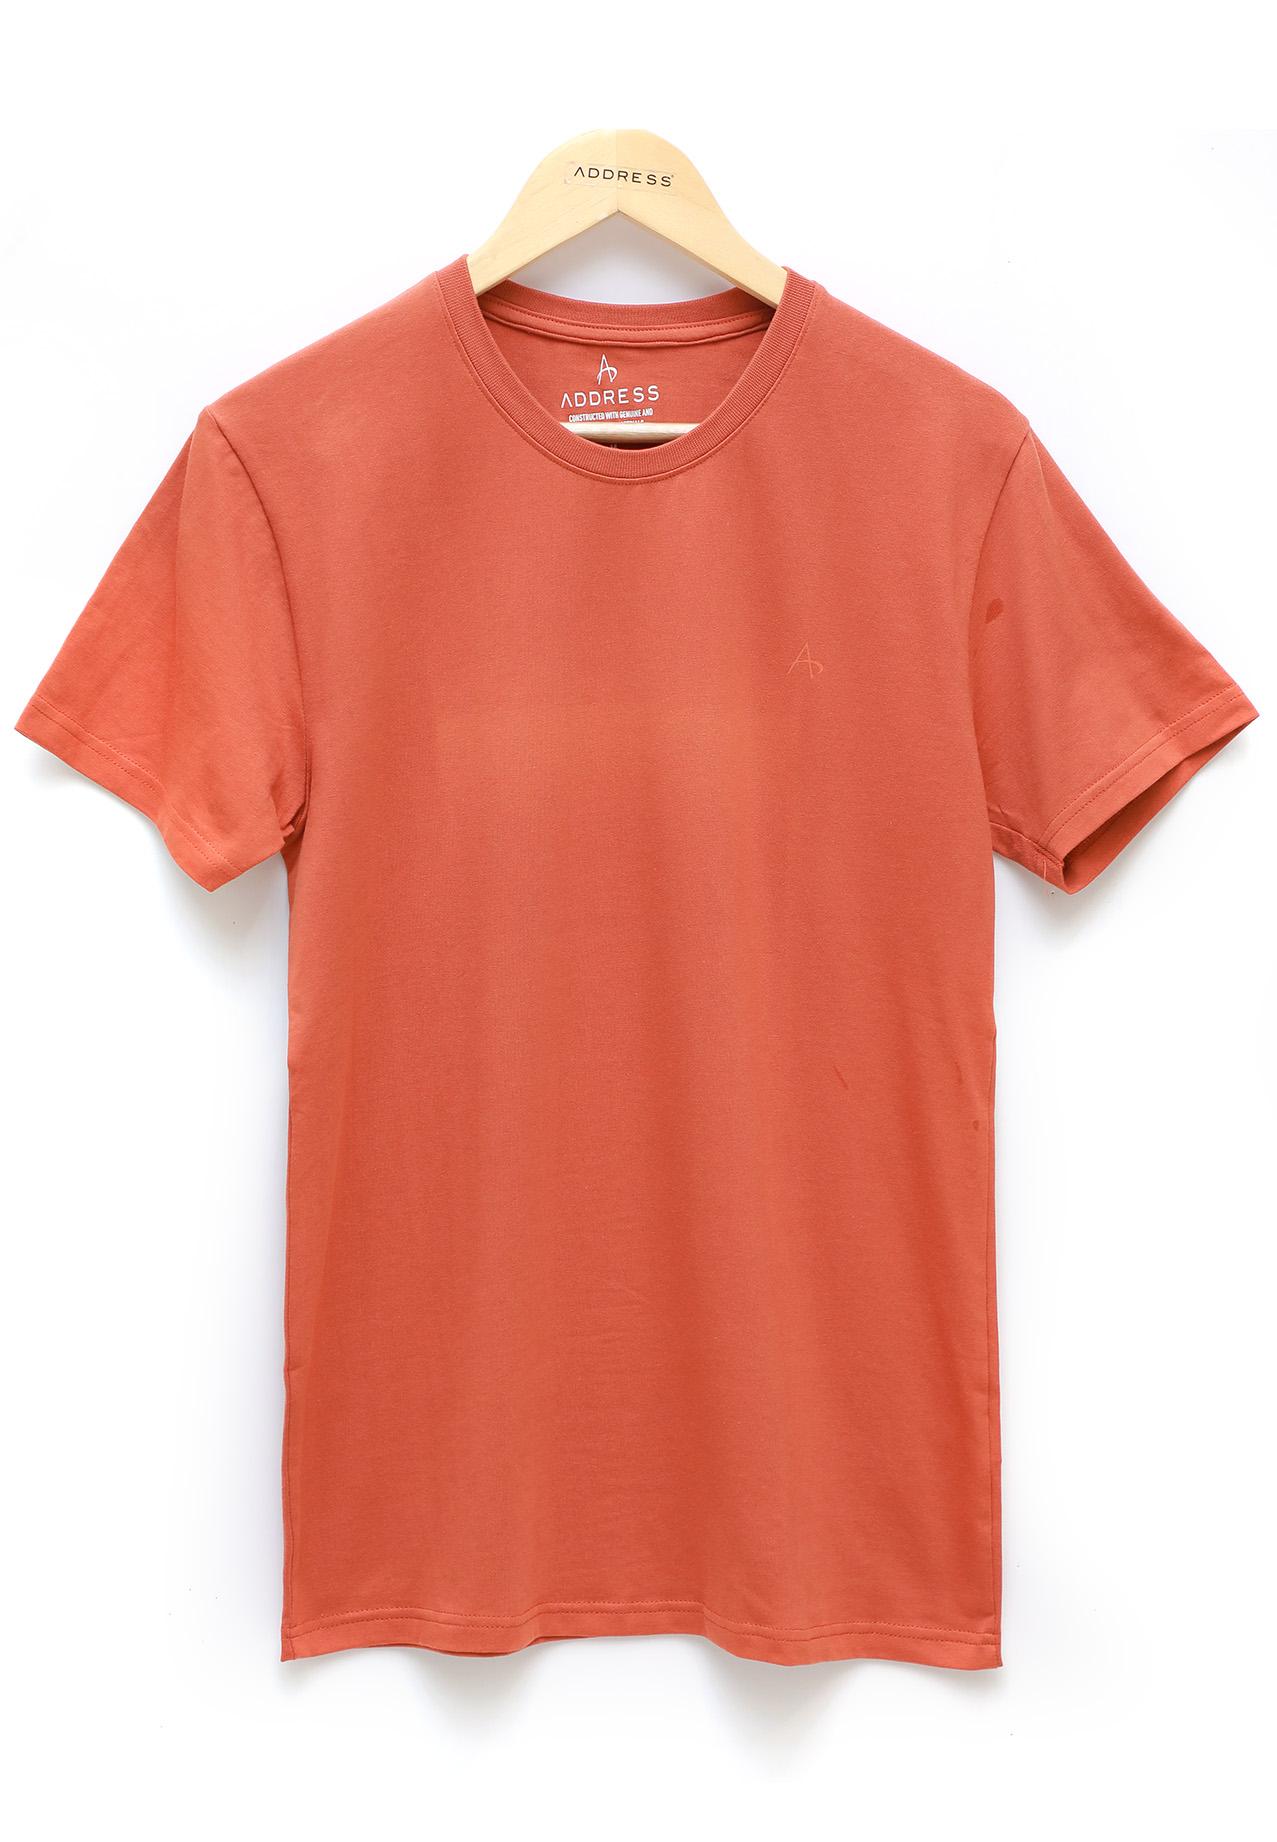 Address Orange Plain T-Shirt Round Neck, XL